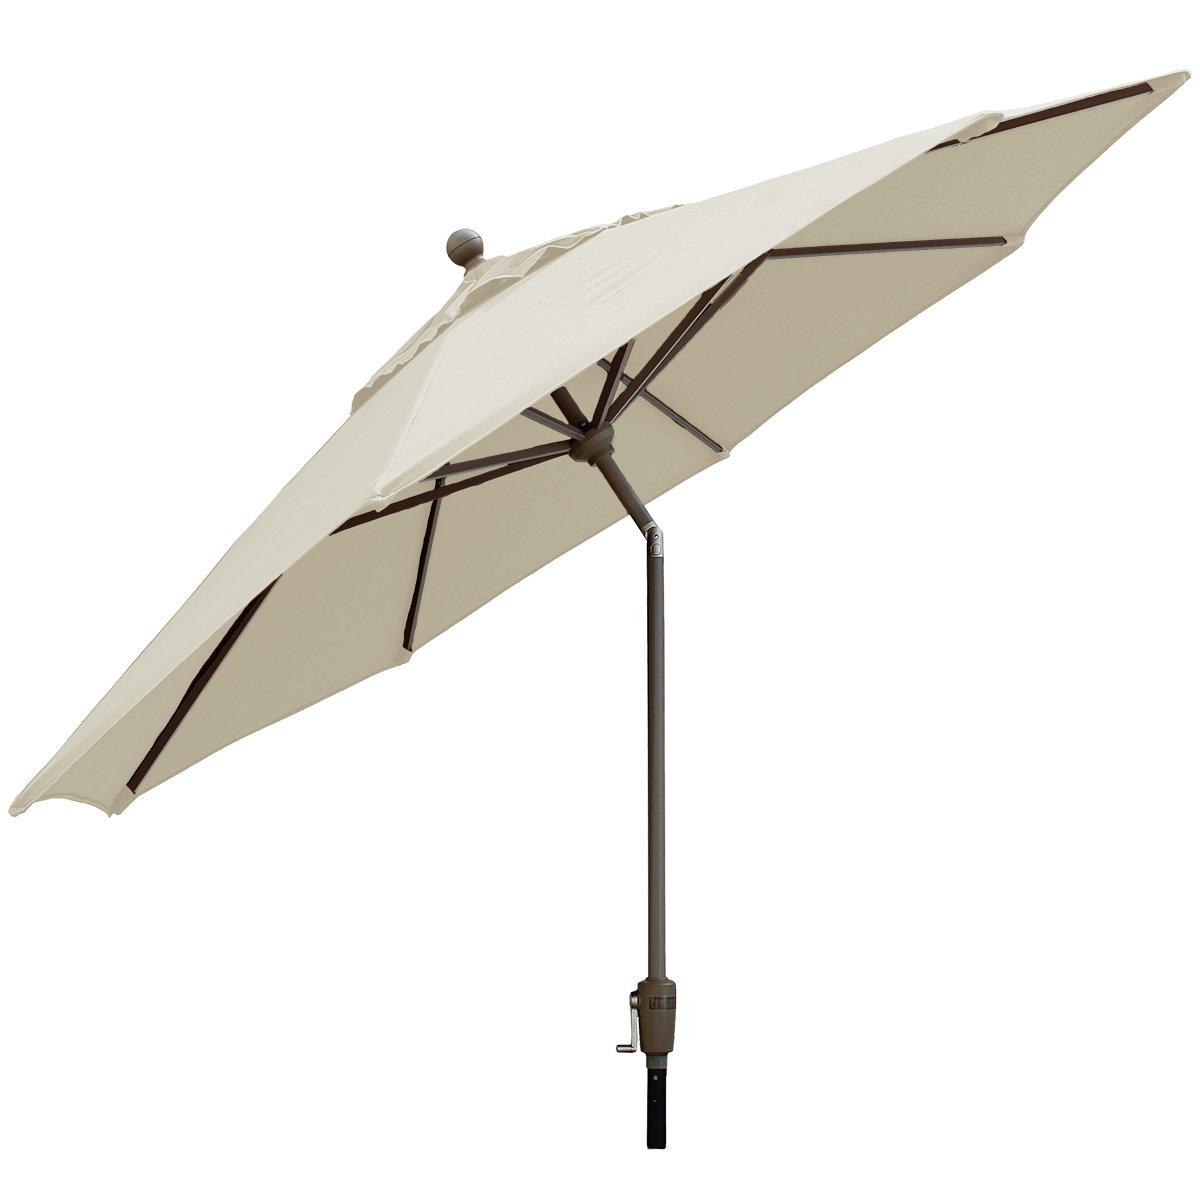 Fashionable Crowland Market Sunbrella Umbrellas Inside Crowland 9' Market Sunbrella Umbrella (View 2 of 20)